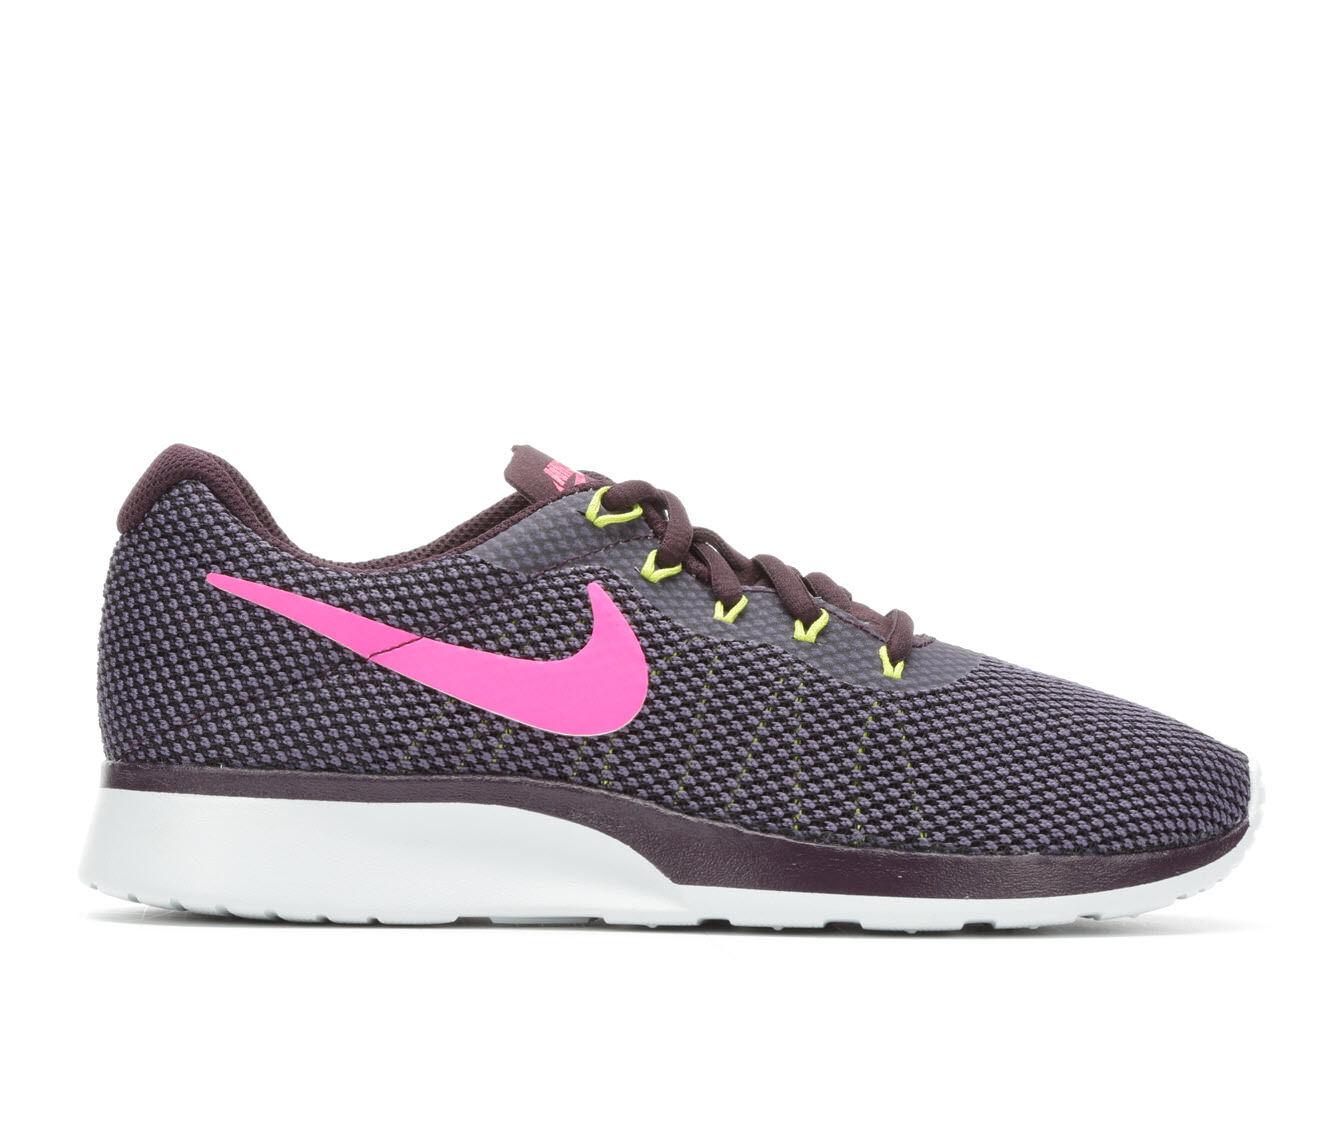 cheap for discount 68ceb 0eb3f ... usa womens nike tanjun racer sneakers shoe carnival ba849 73efd